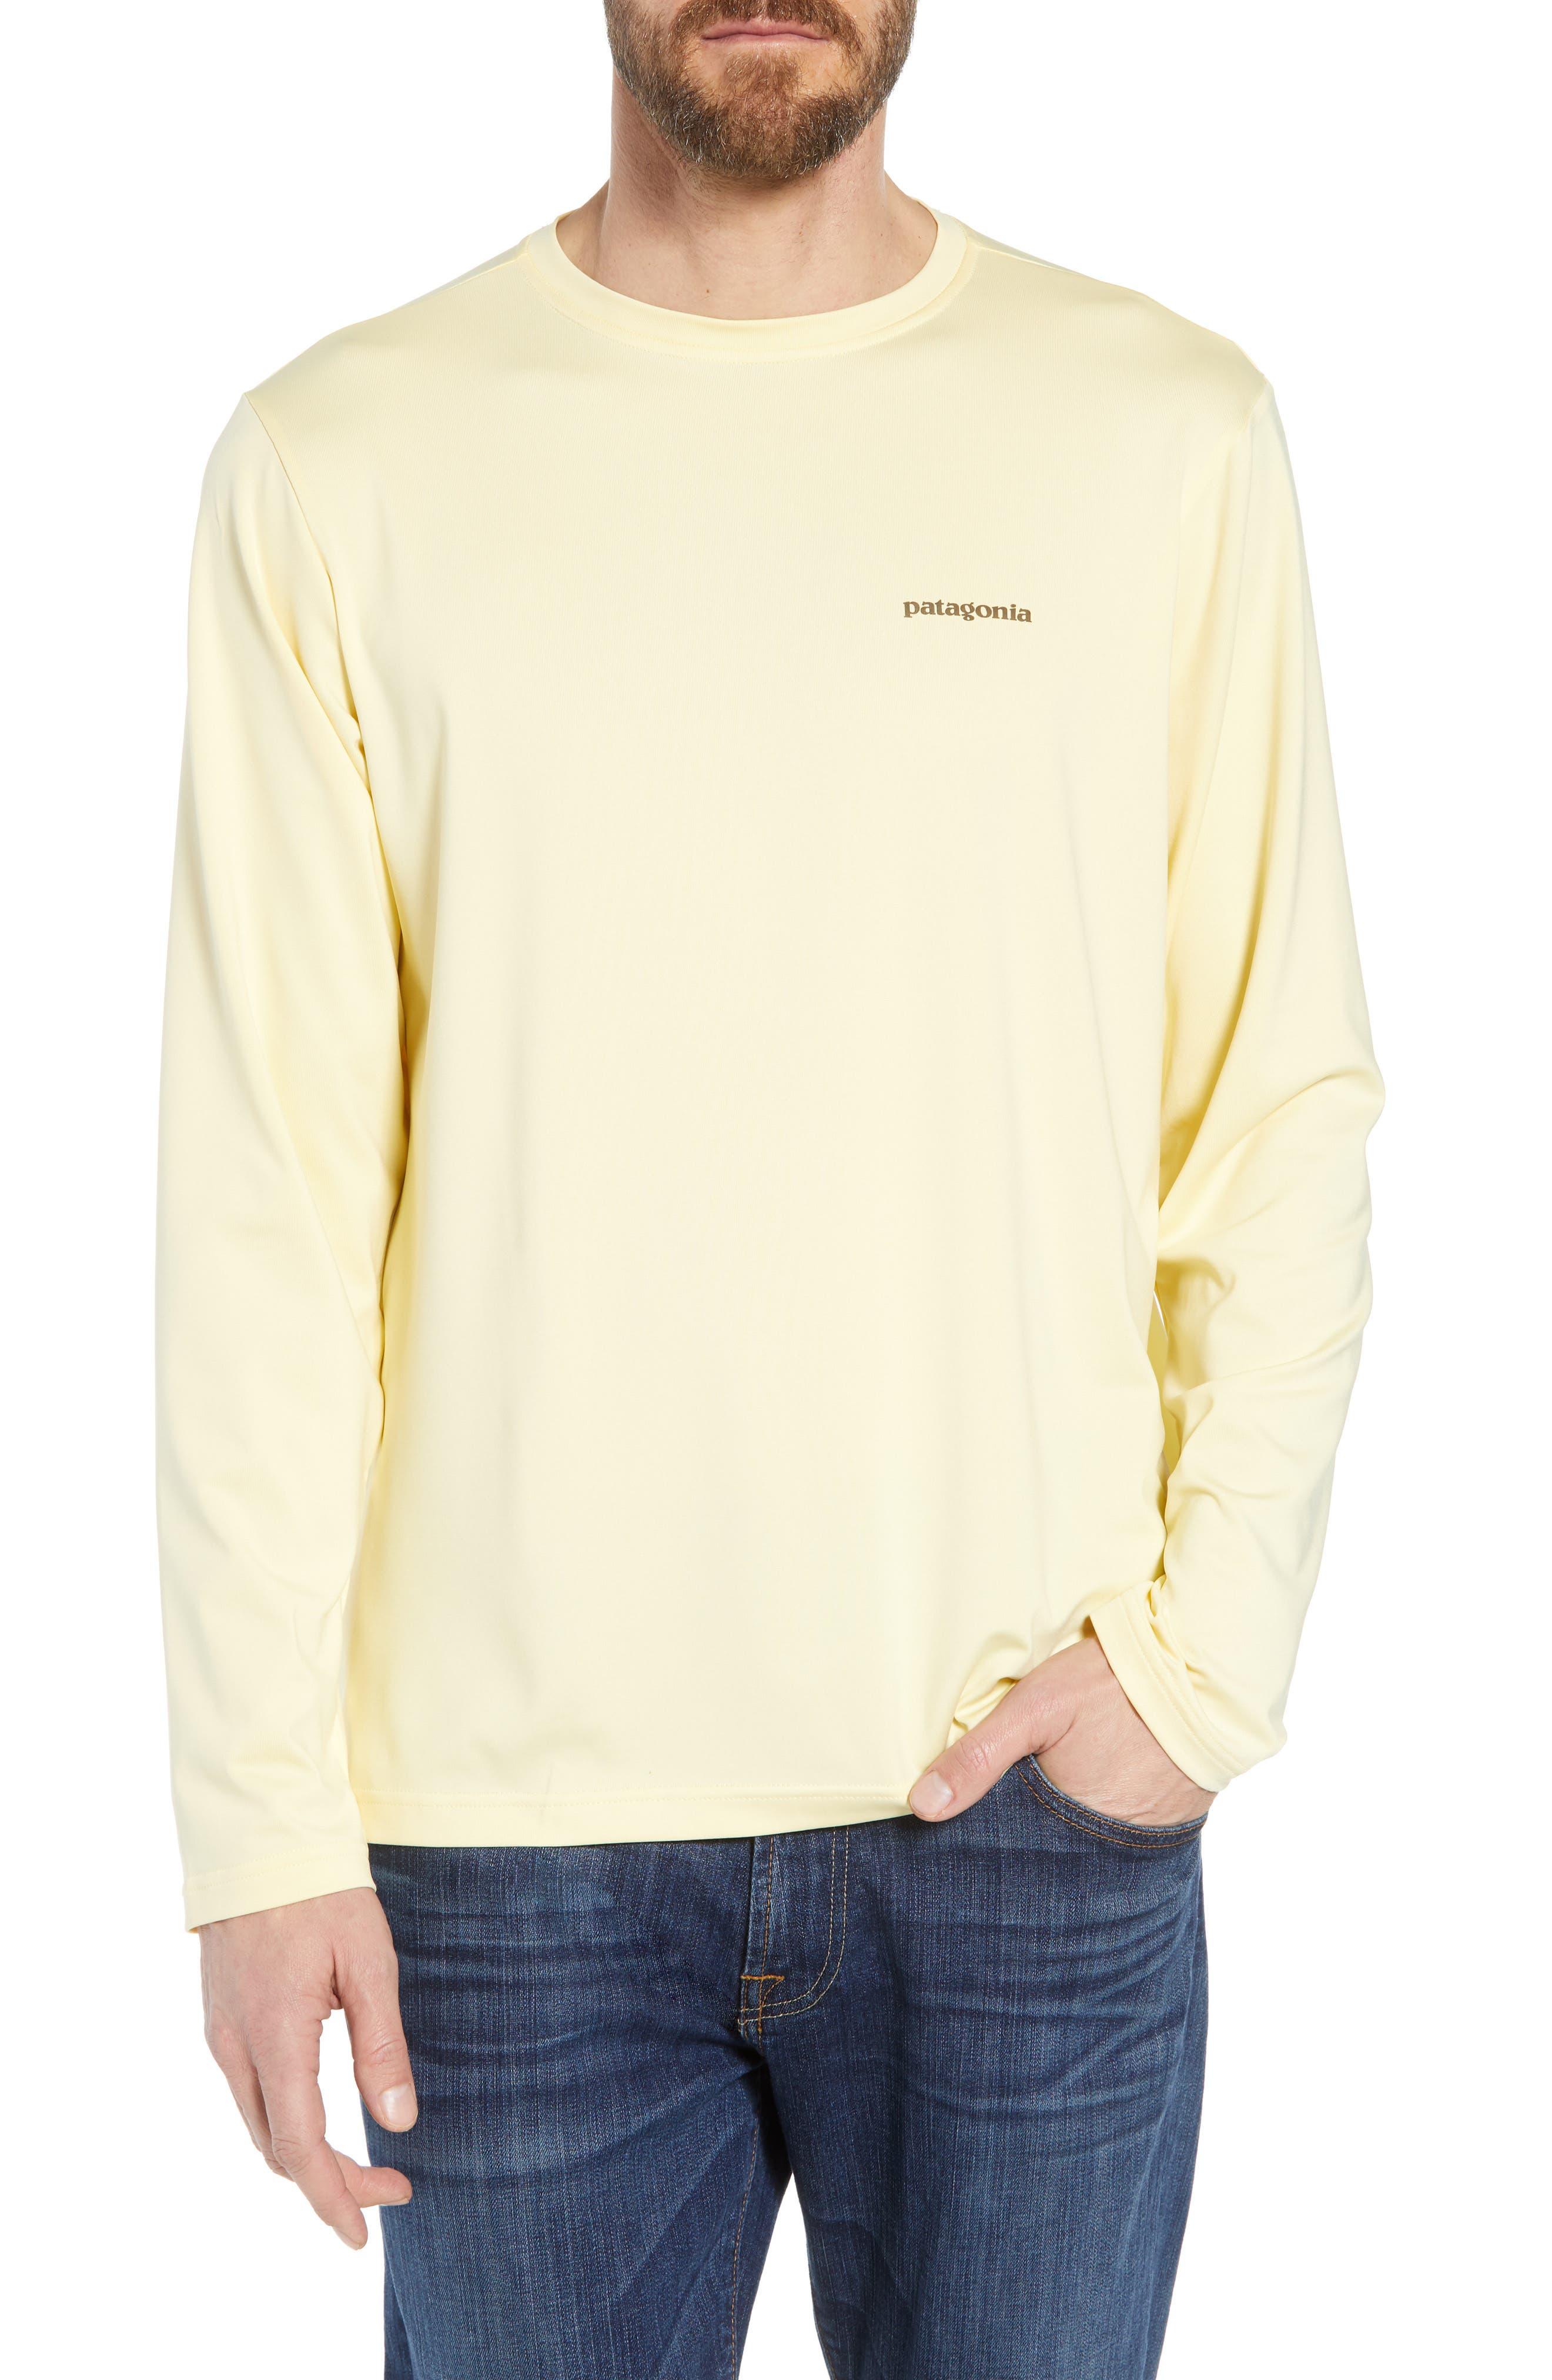 Patagonia Tech Fish Graphic Long Sleeve T-Shirt